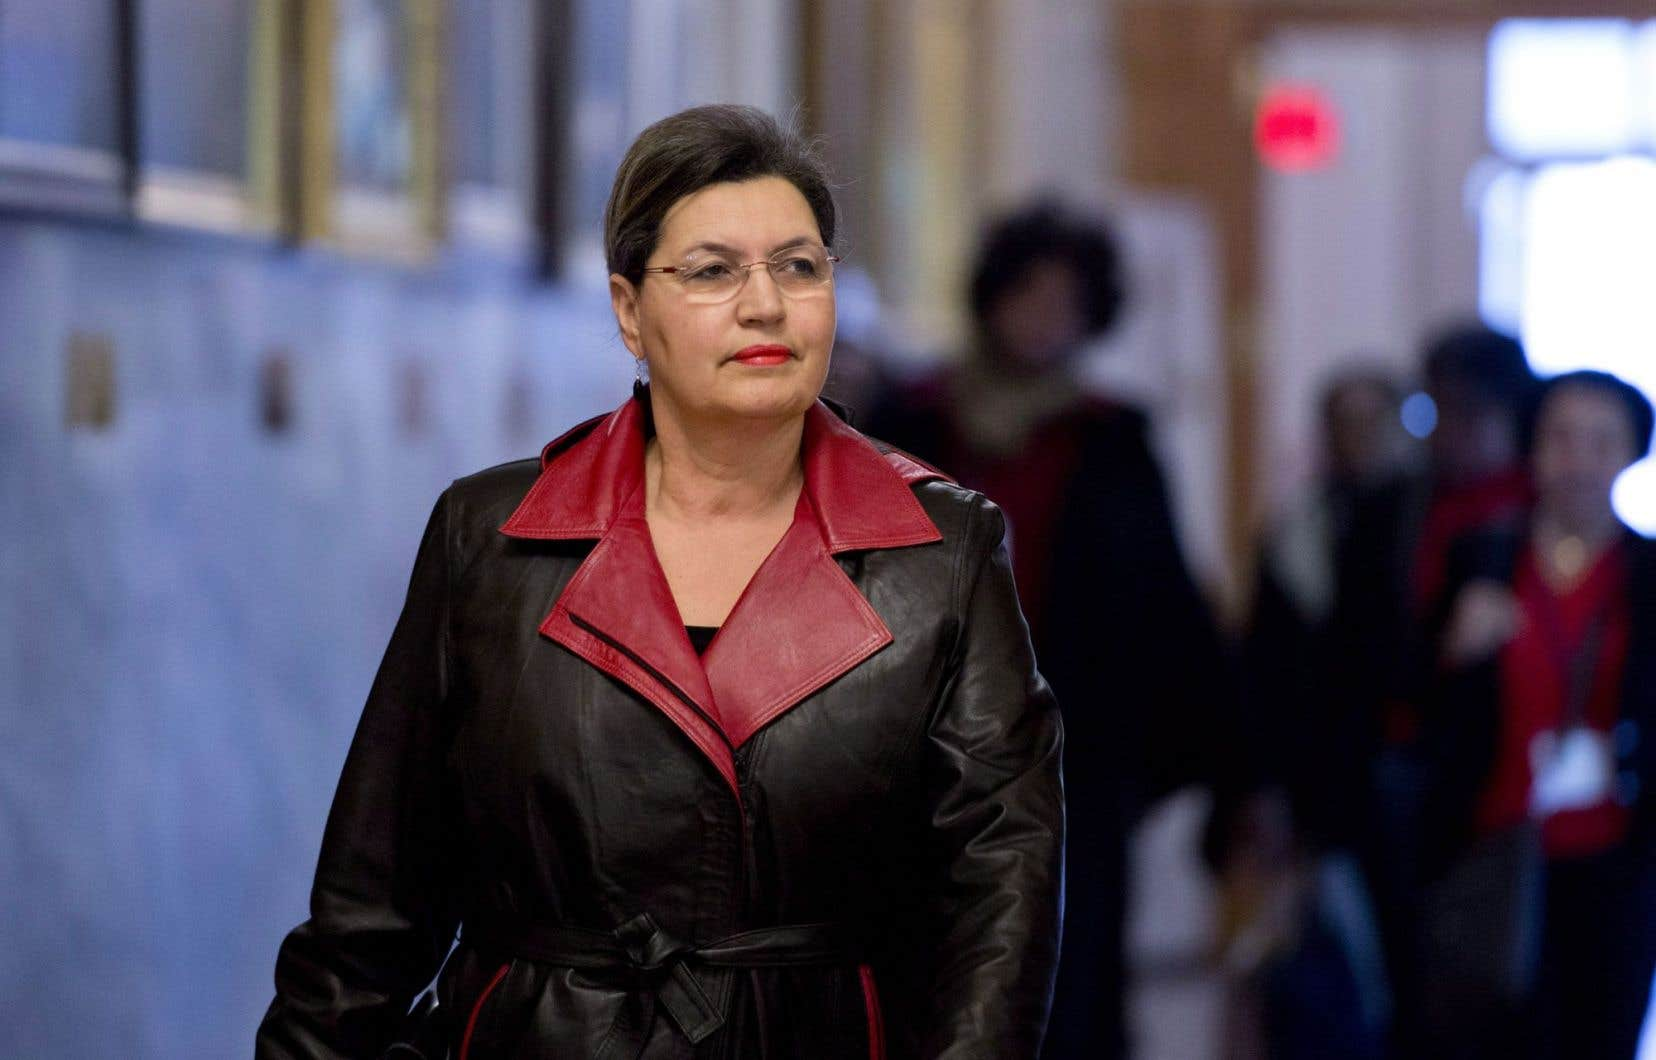 Fatima Houda-Pepin marche vers une réunion du causus libéral en janvier 2014.